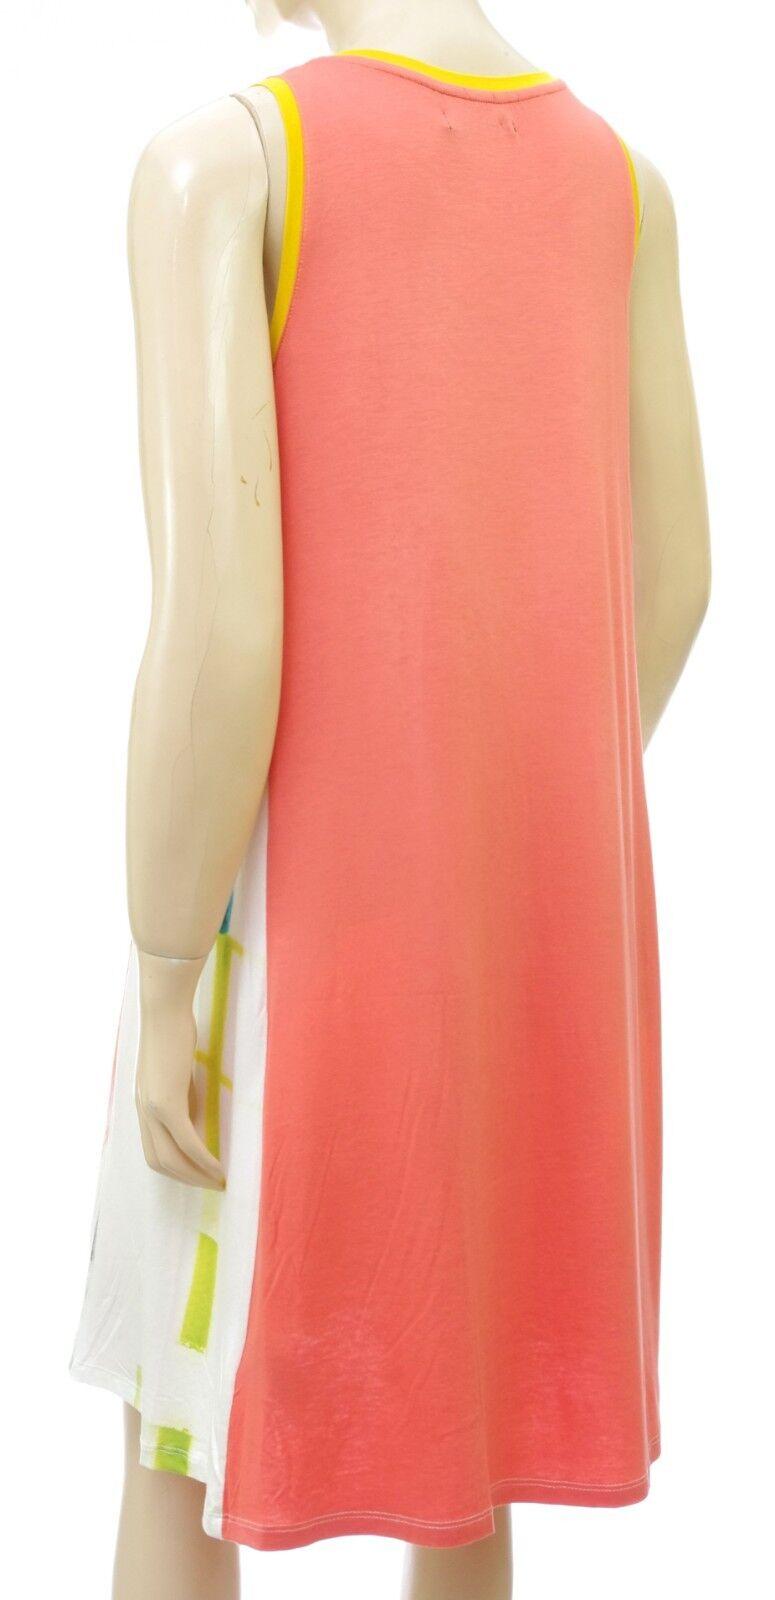 DESIGUAL trapèze Vest ELENA Robe femme 18SWVK91 coloris 3213 taille XL